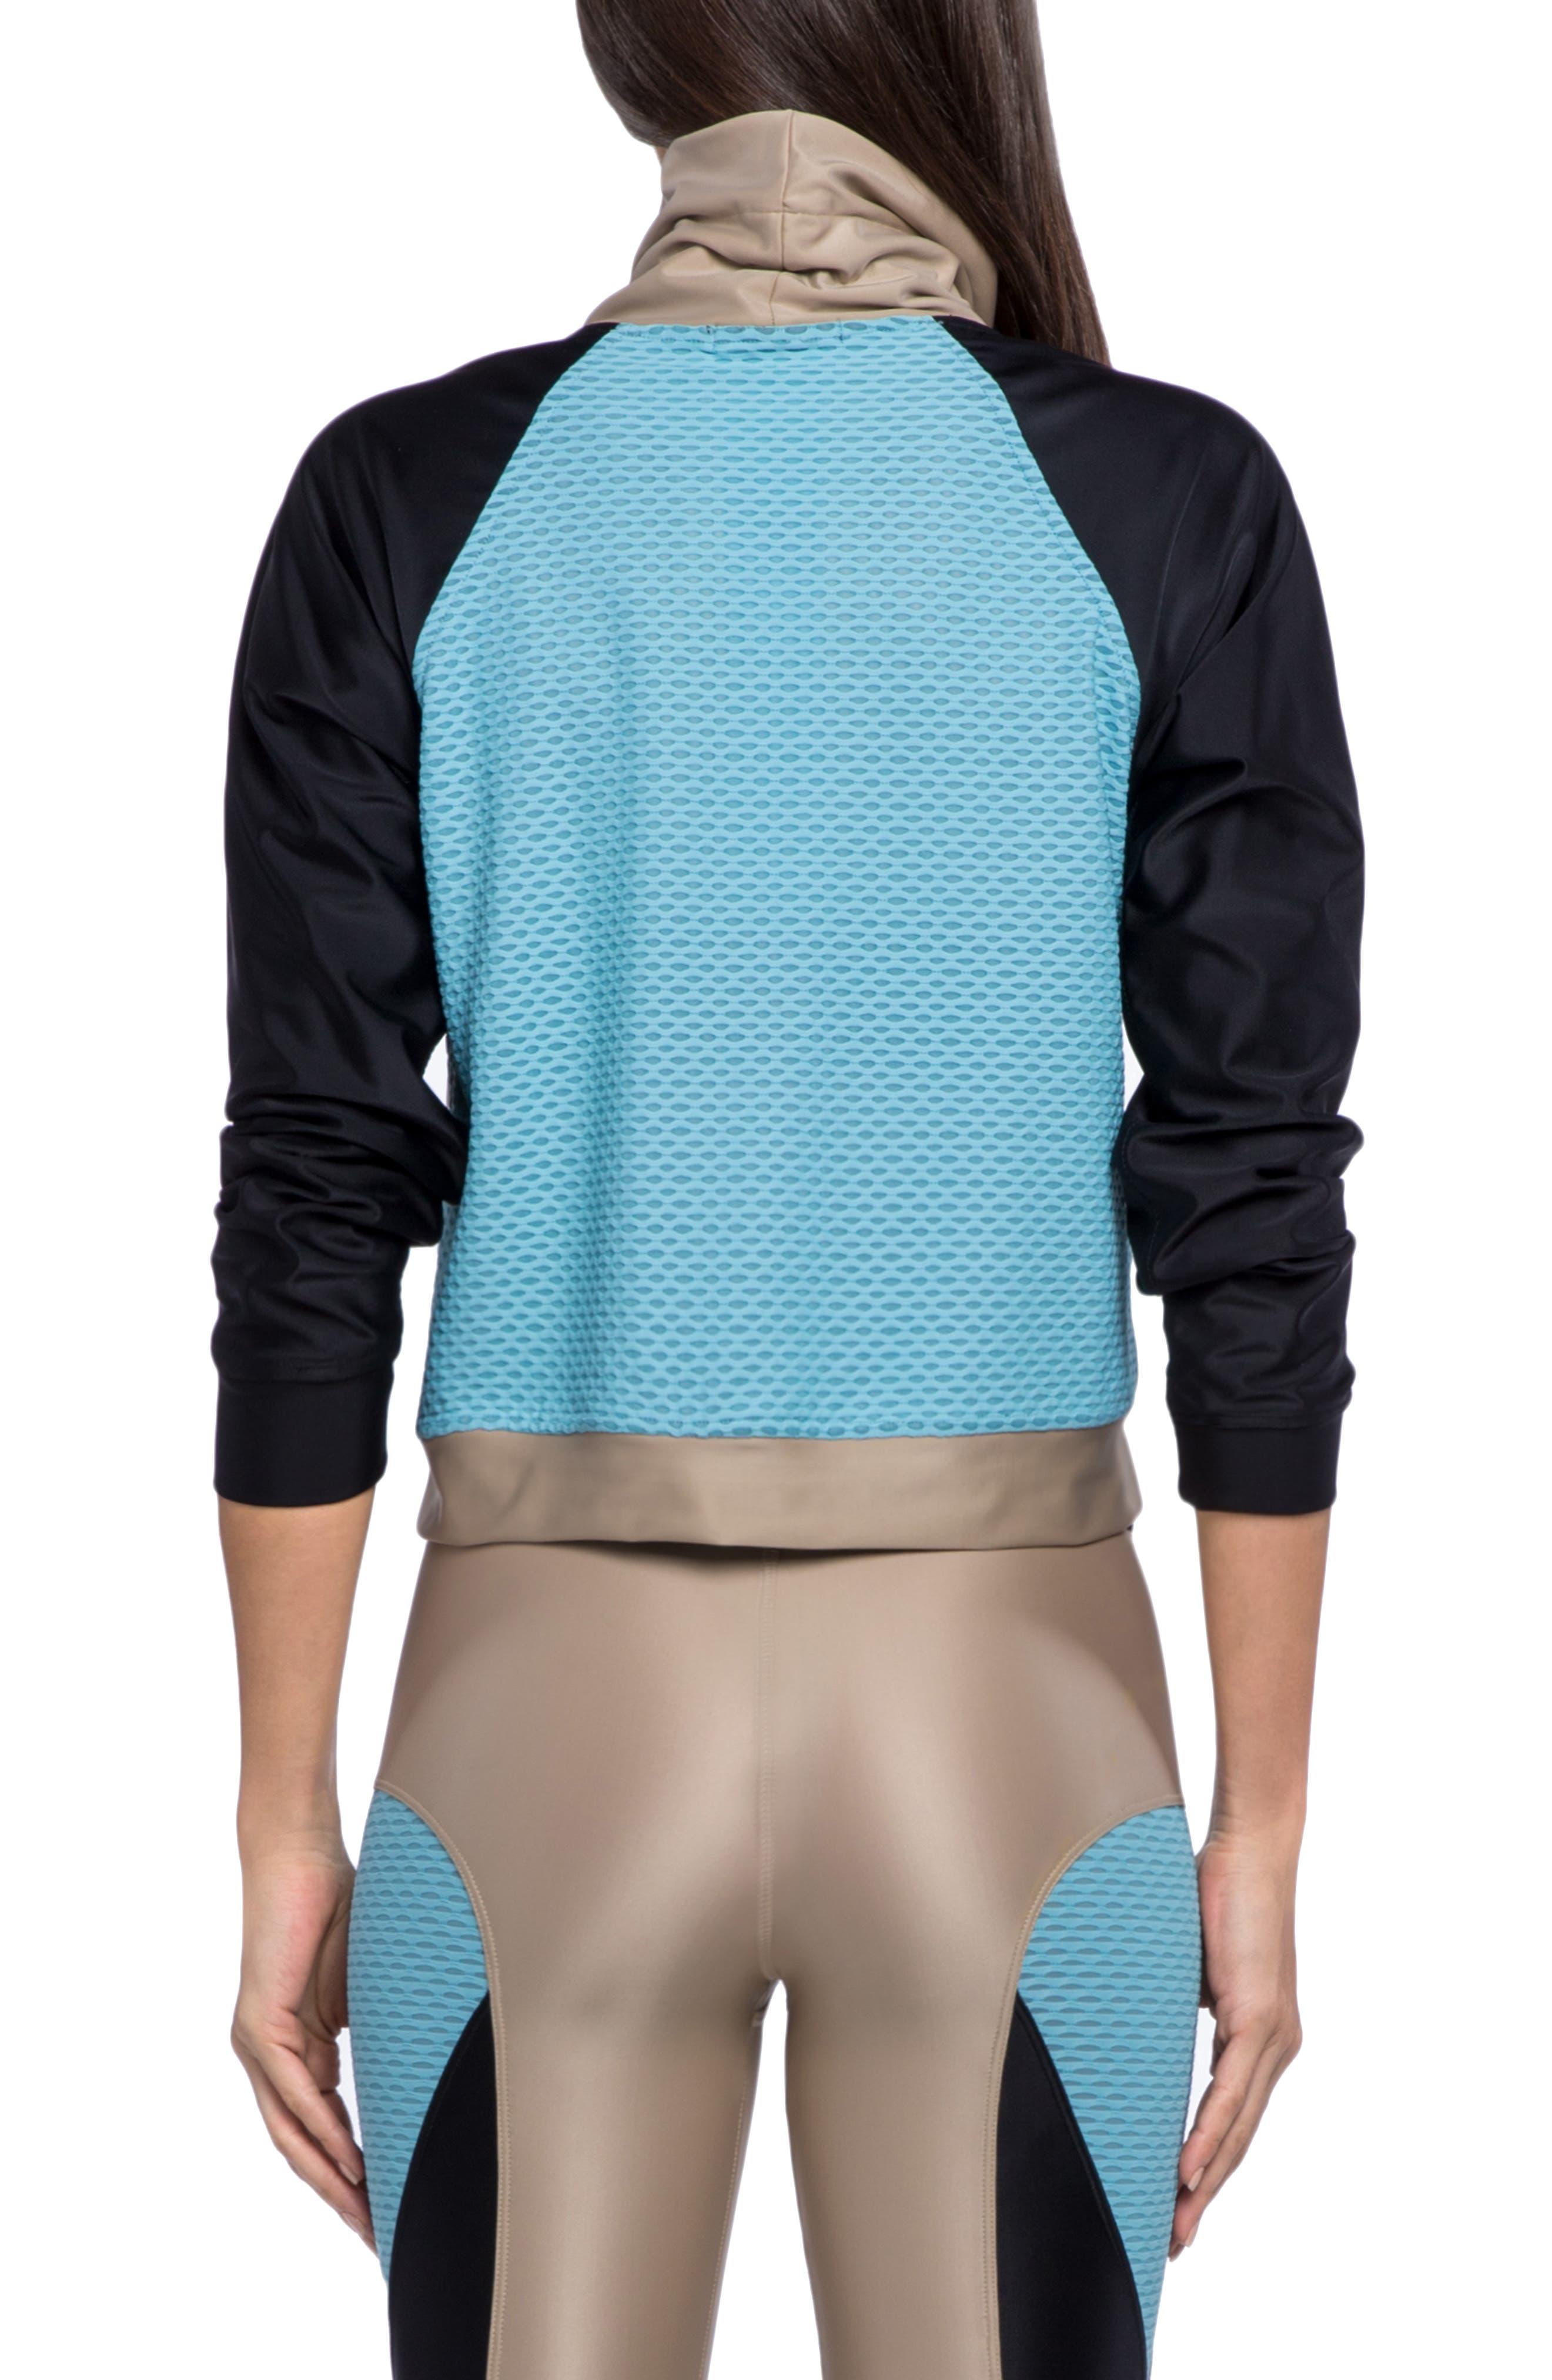 Pump Energy Sweatshirt,                             Alternate thumbnail 2, color,                             001